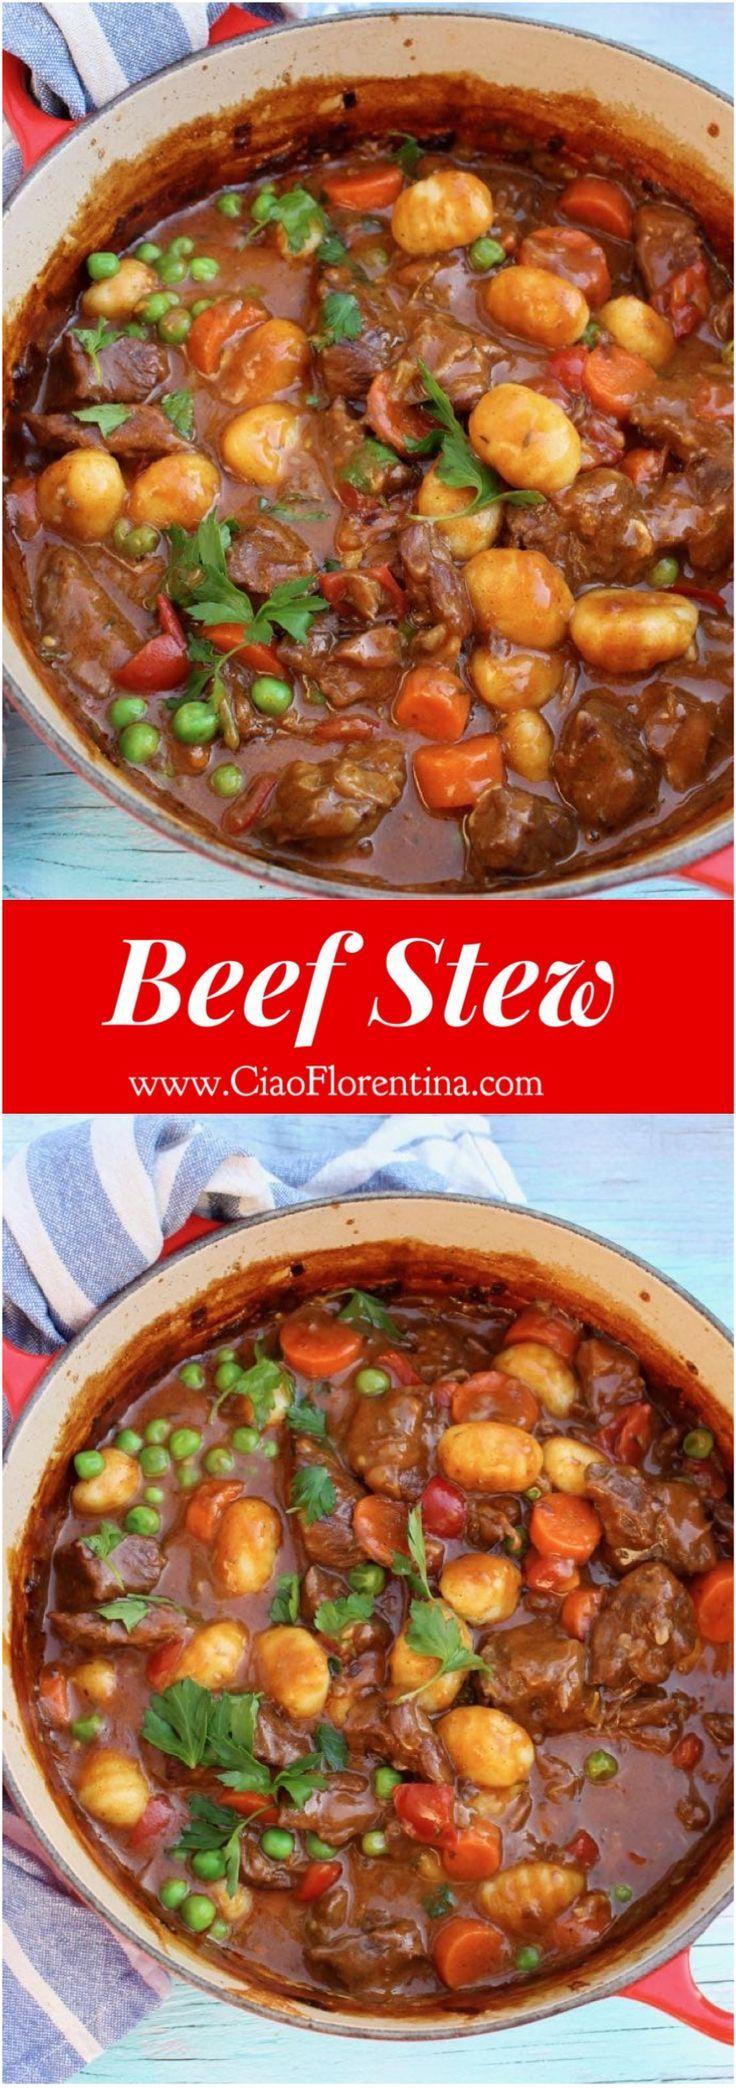 Photo of Homemade Beef Stew Recipe • CiaoFlorentina